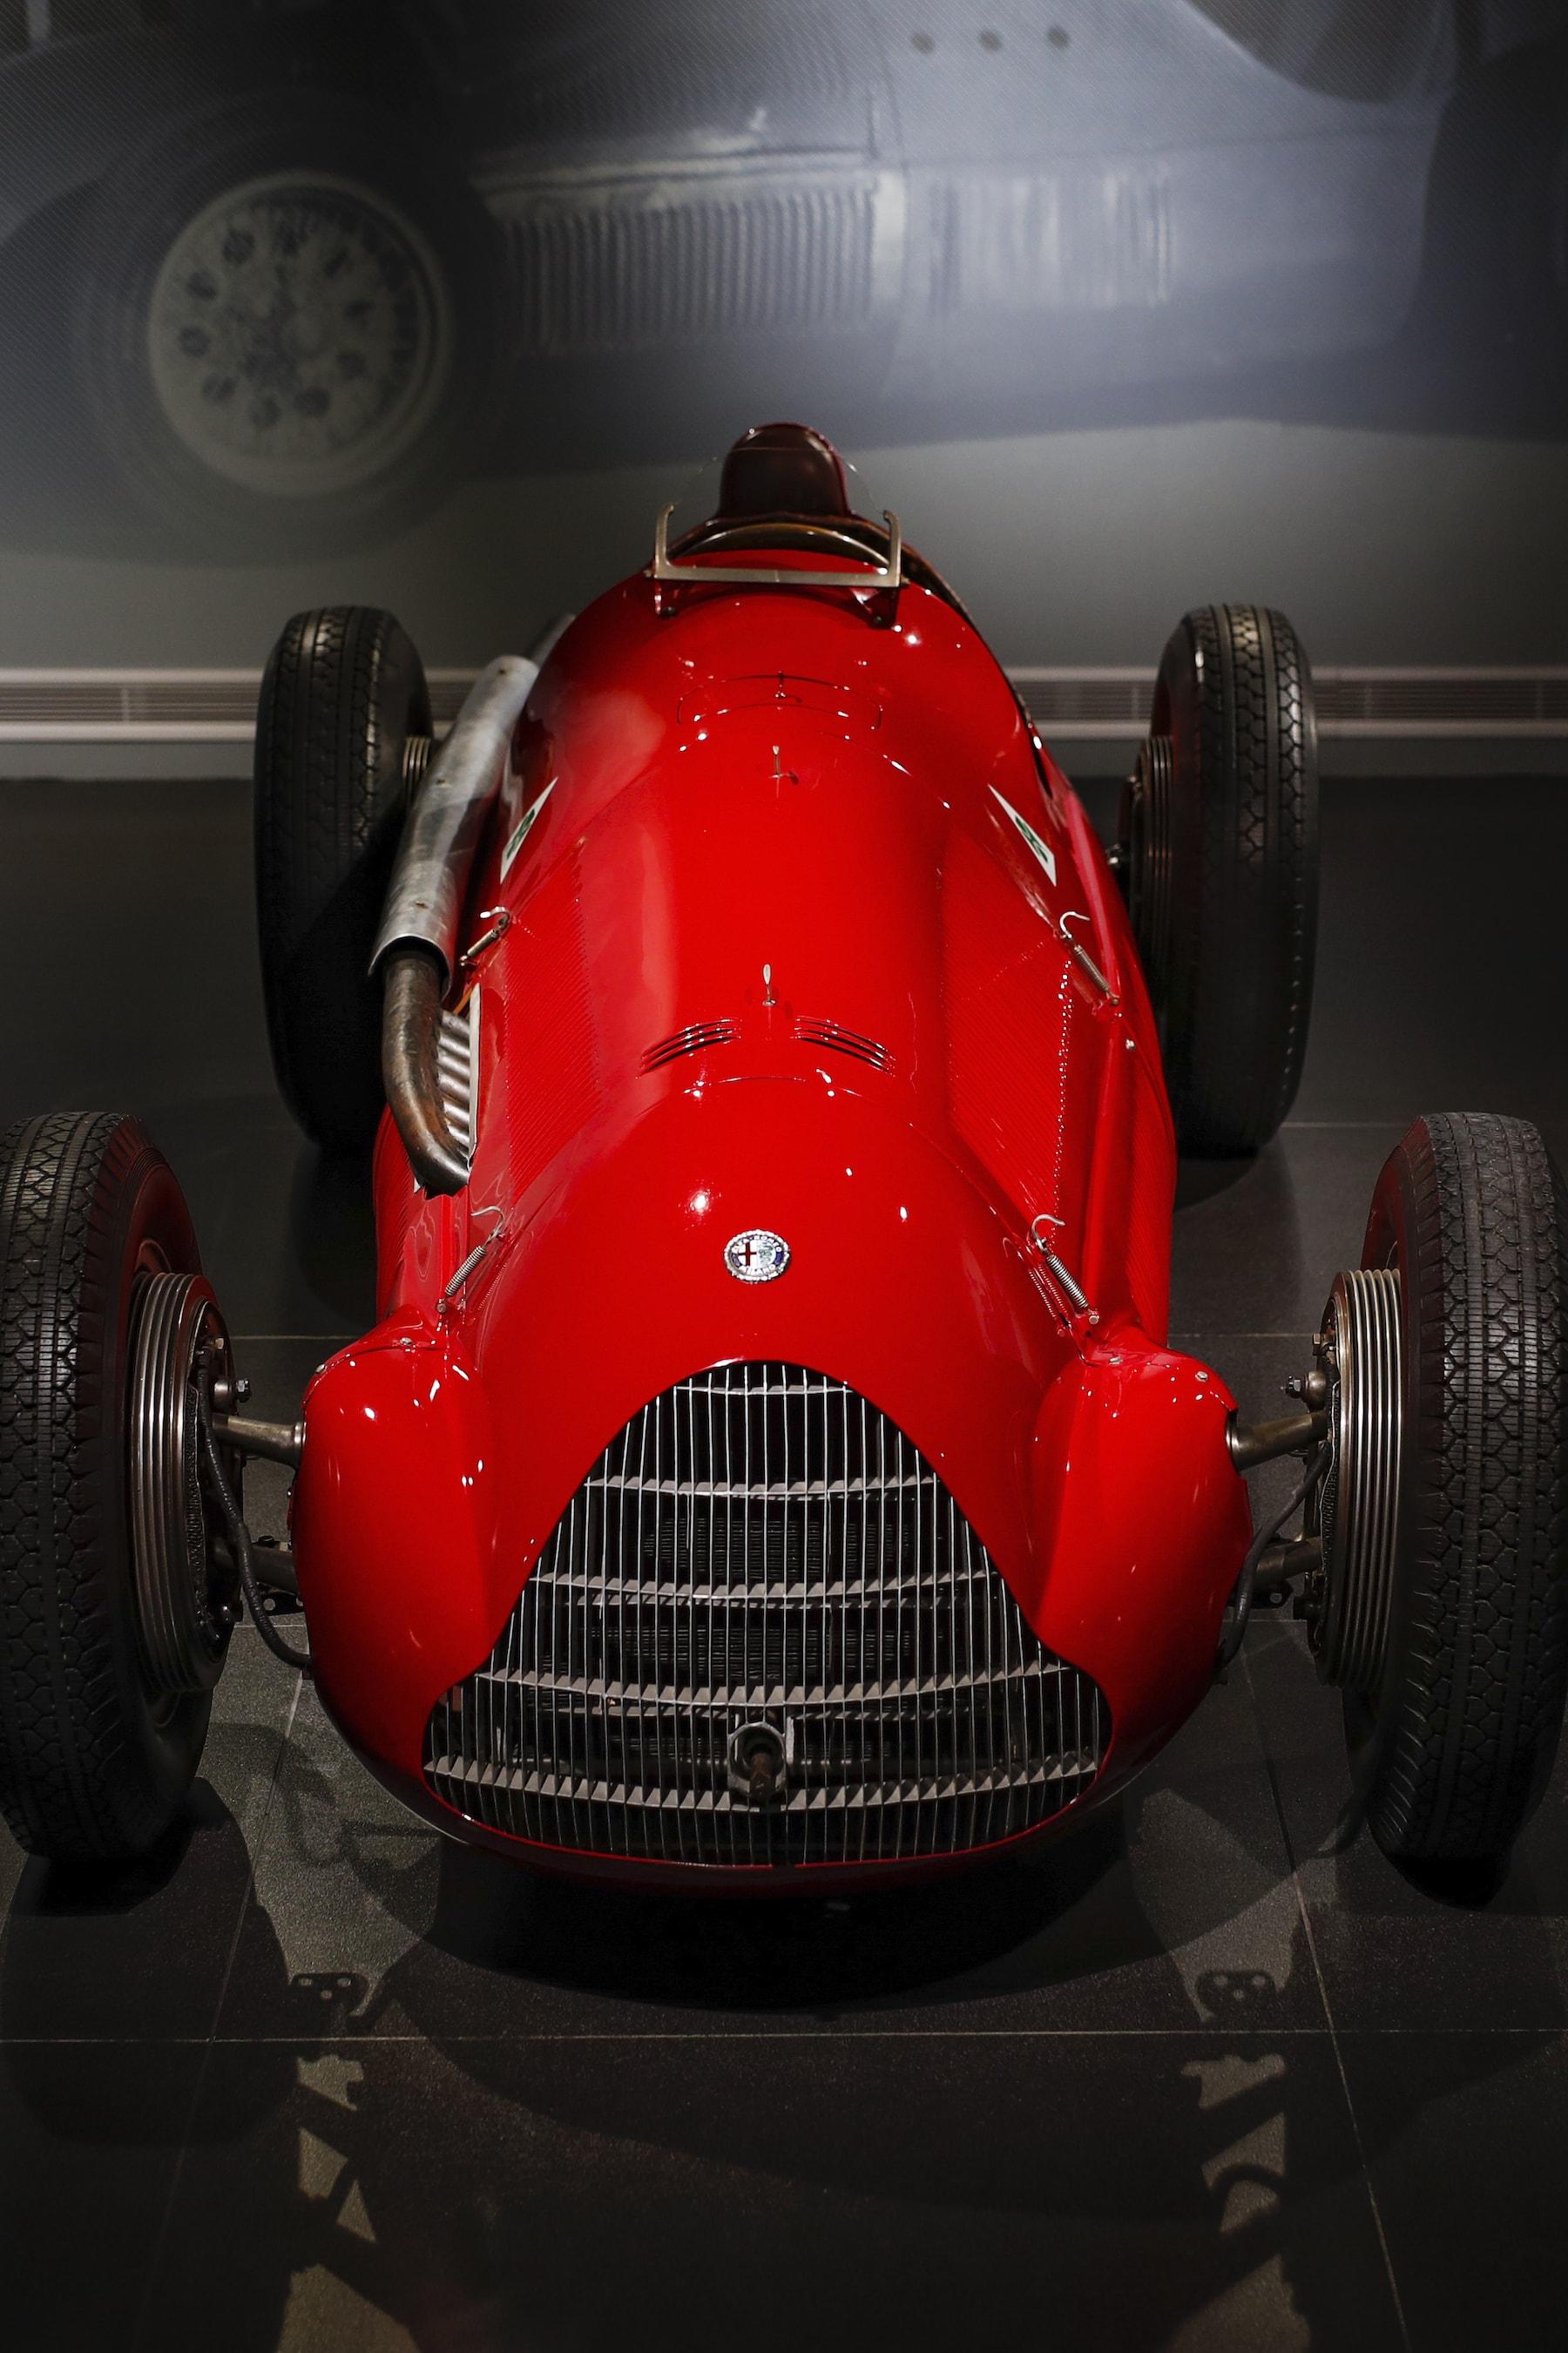 2019 Alfa Romeo at Museo Storico | 2019 Italian GP 14.jpg